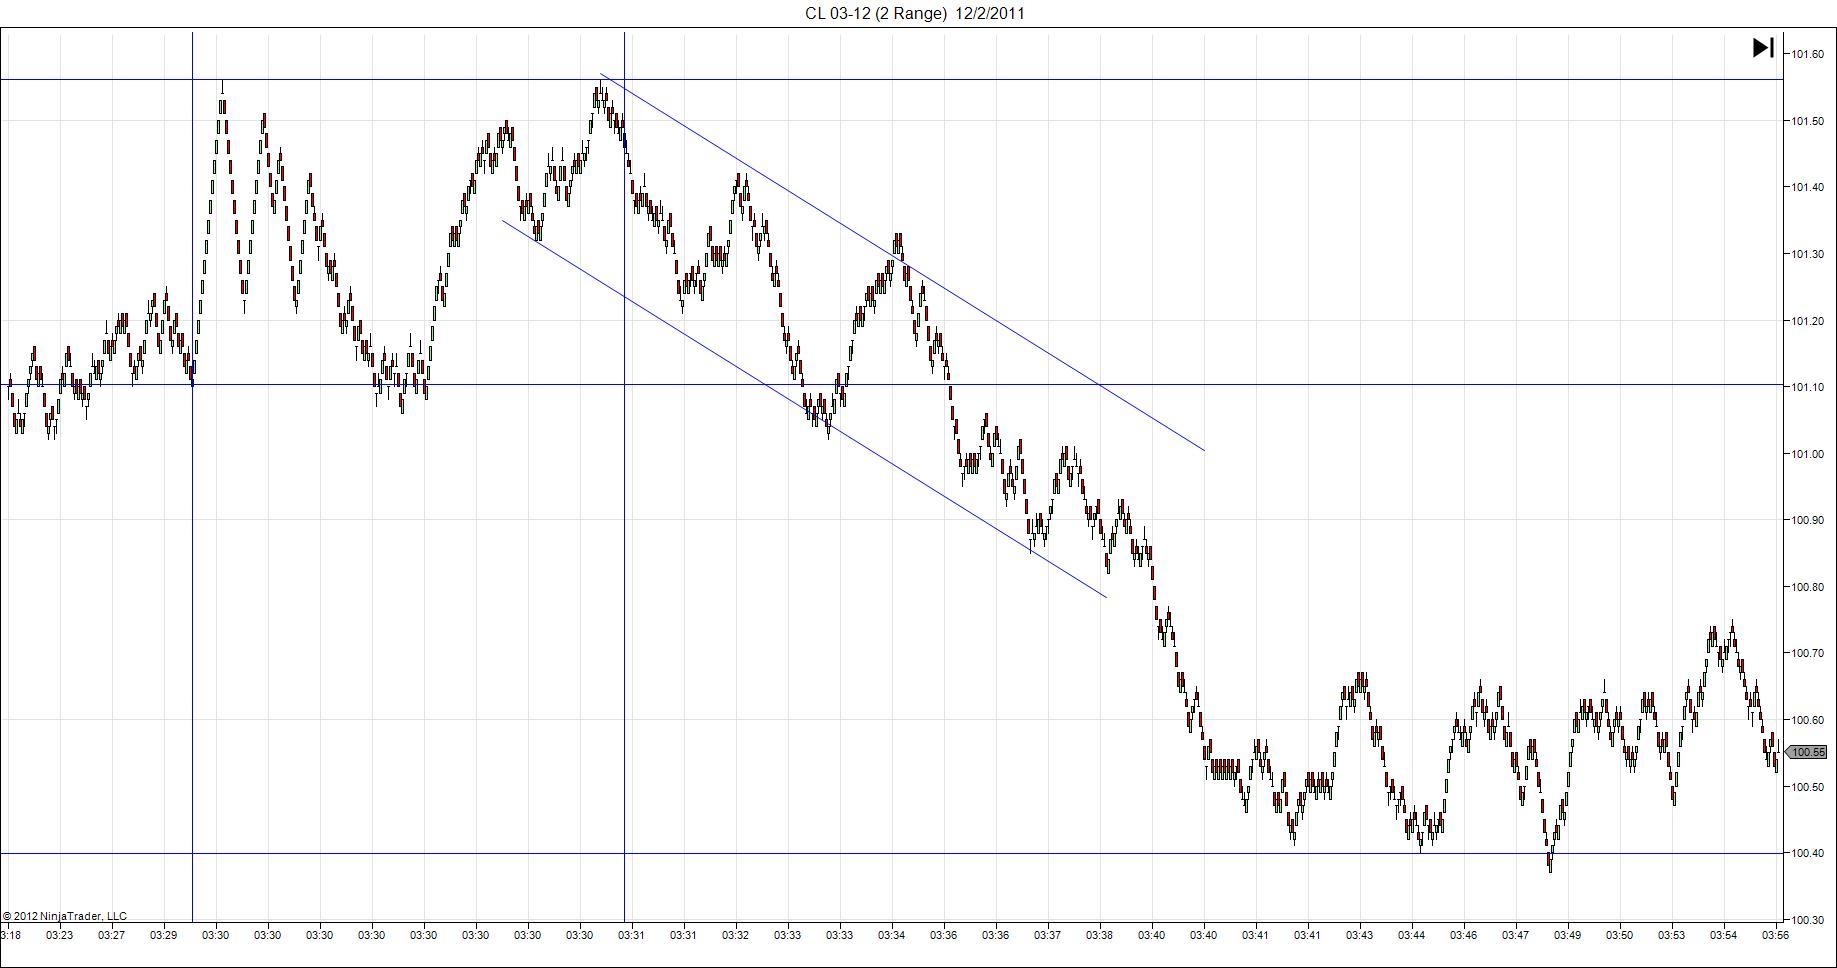 CL 03 12 (2 Range) 12.02.11